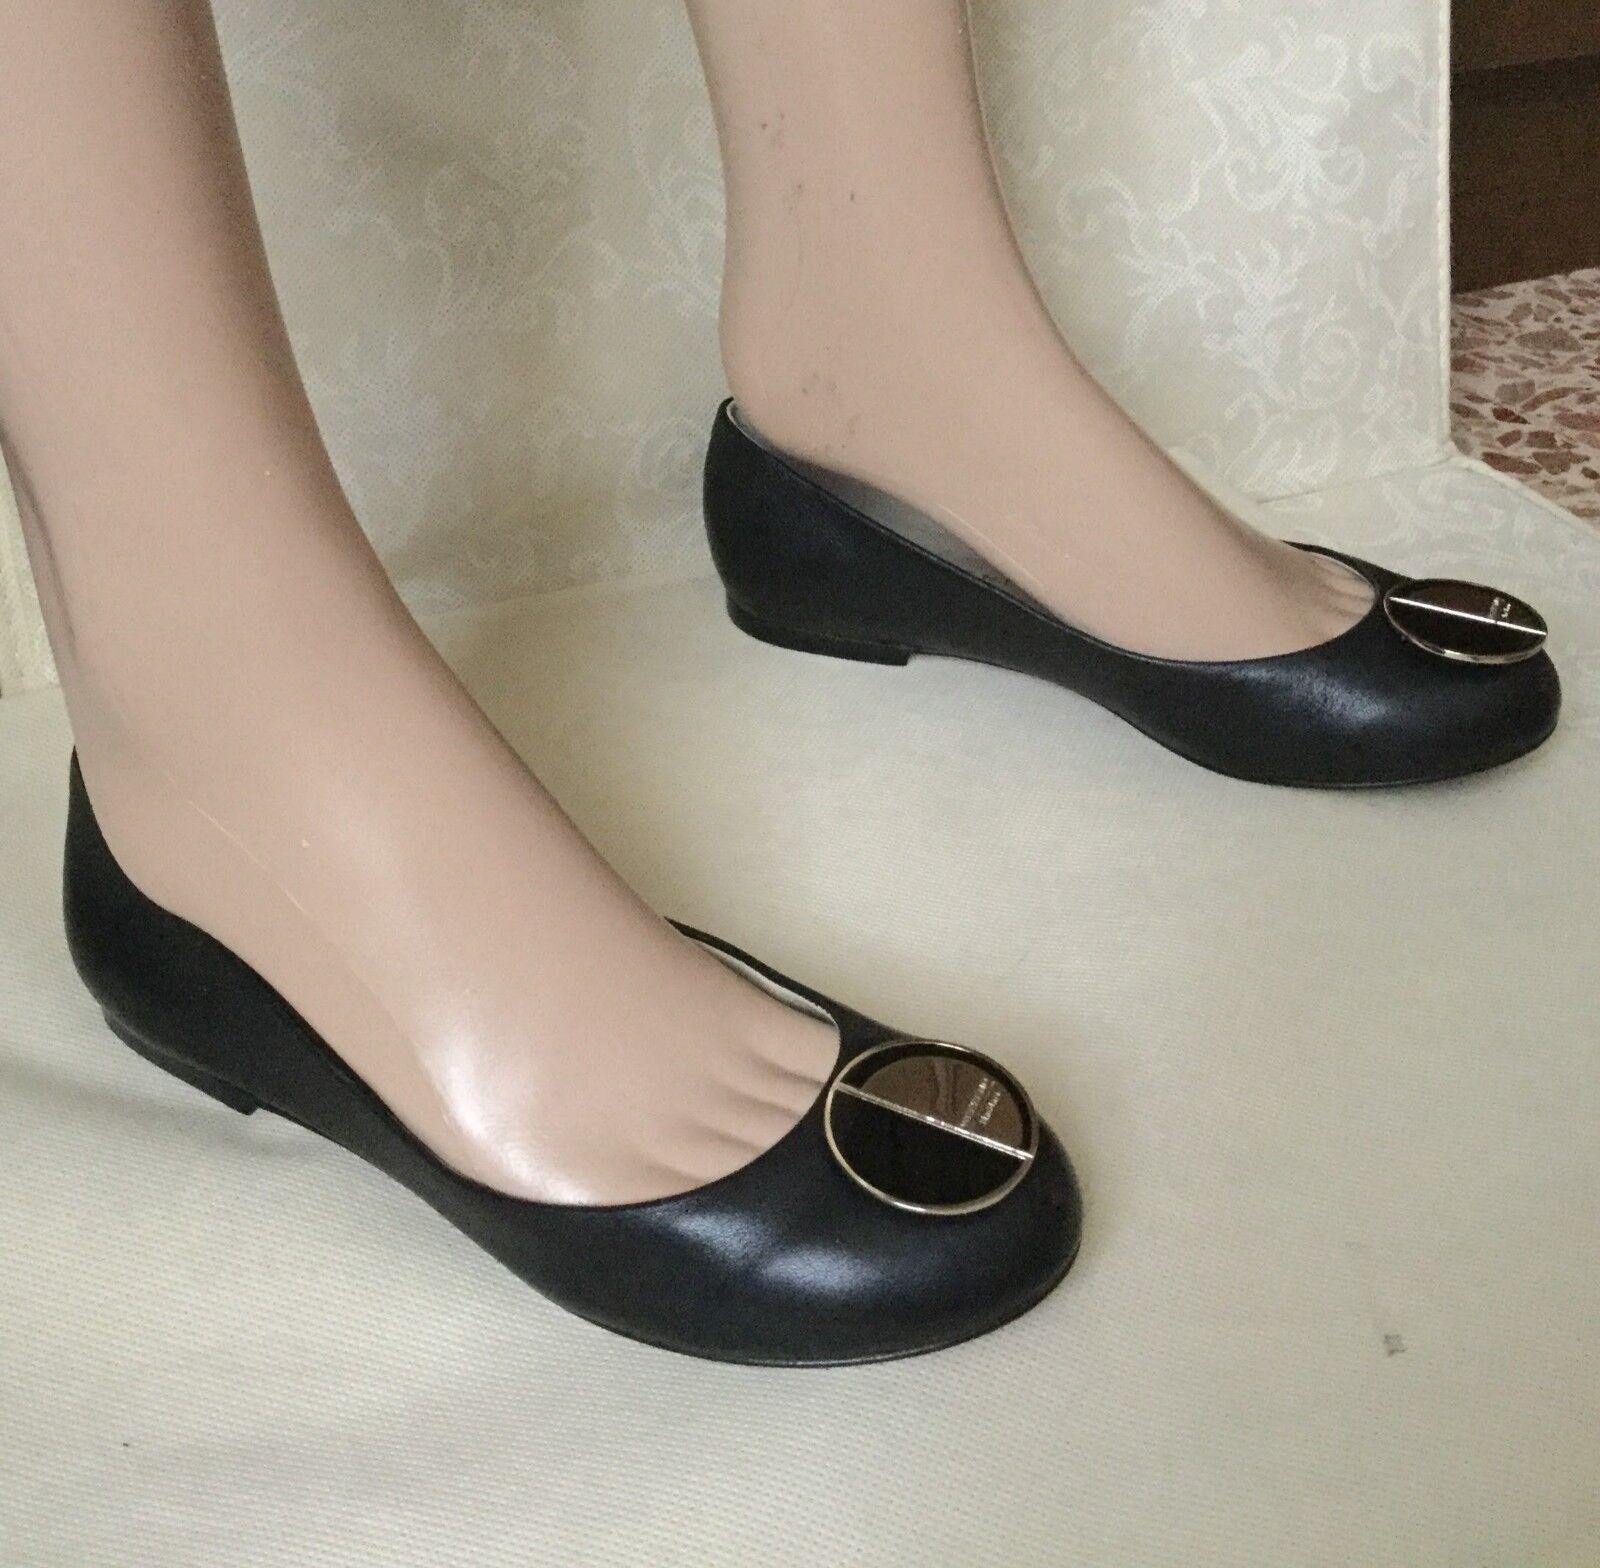 Fantastic scarpe WEEKEND Max Mara Wouomo, nero Coloreee, Dimensione 36, leather Scarpe